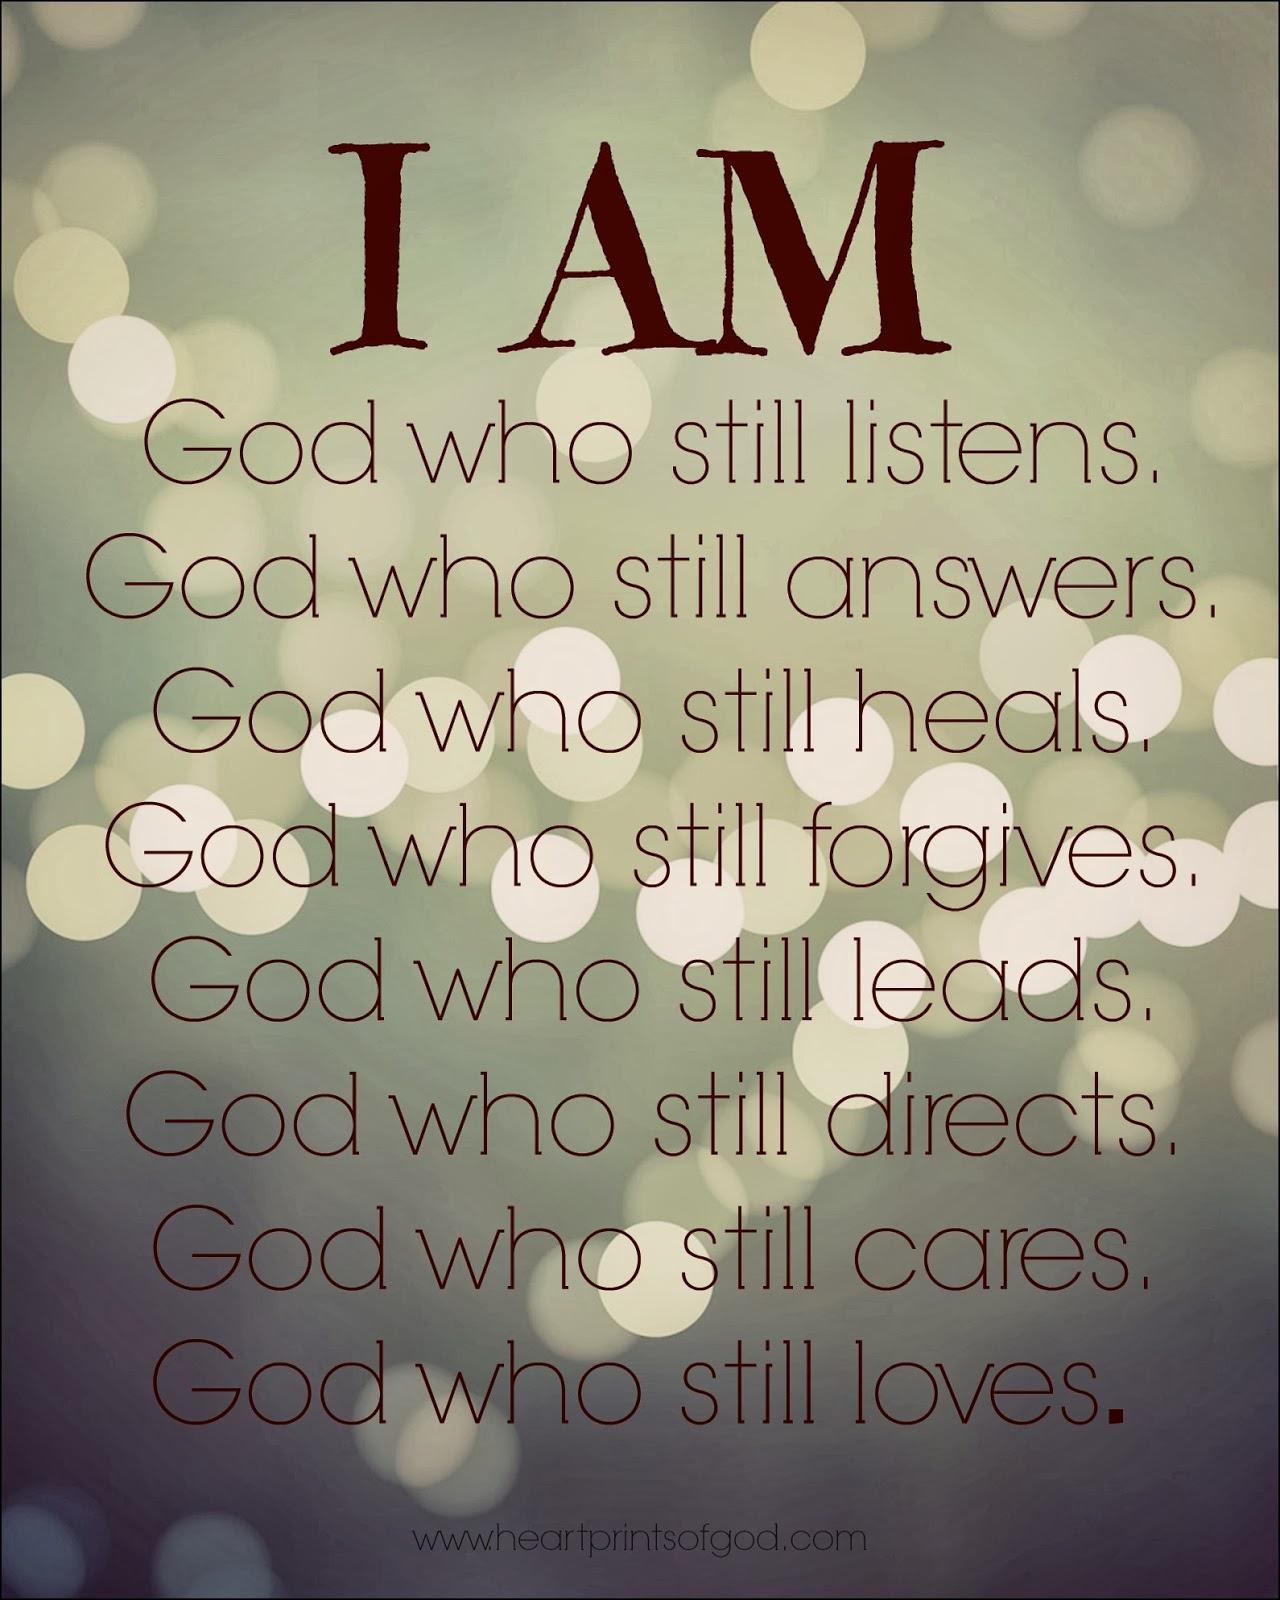 Heartprints Of God: He Still Is